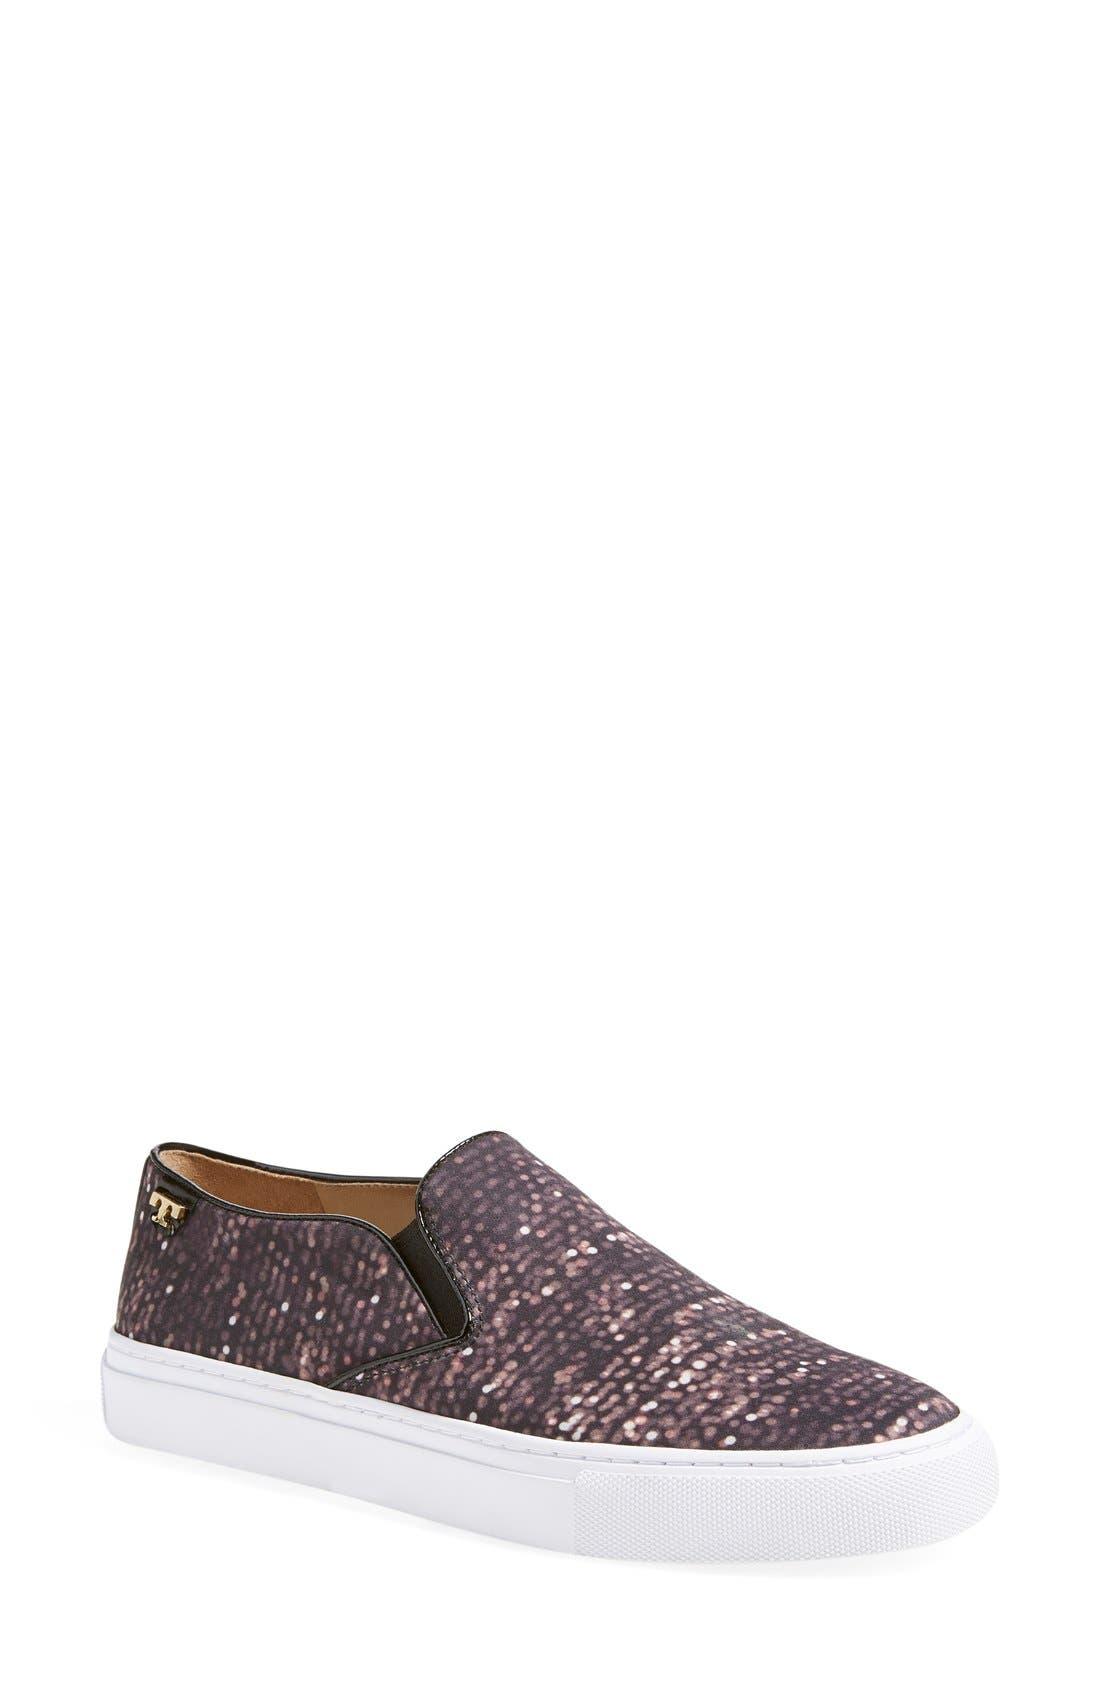 Alternate Image 1 Selected - Tory Burch Print Slip-On Sneaker (Women)